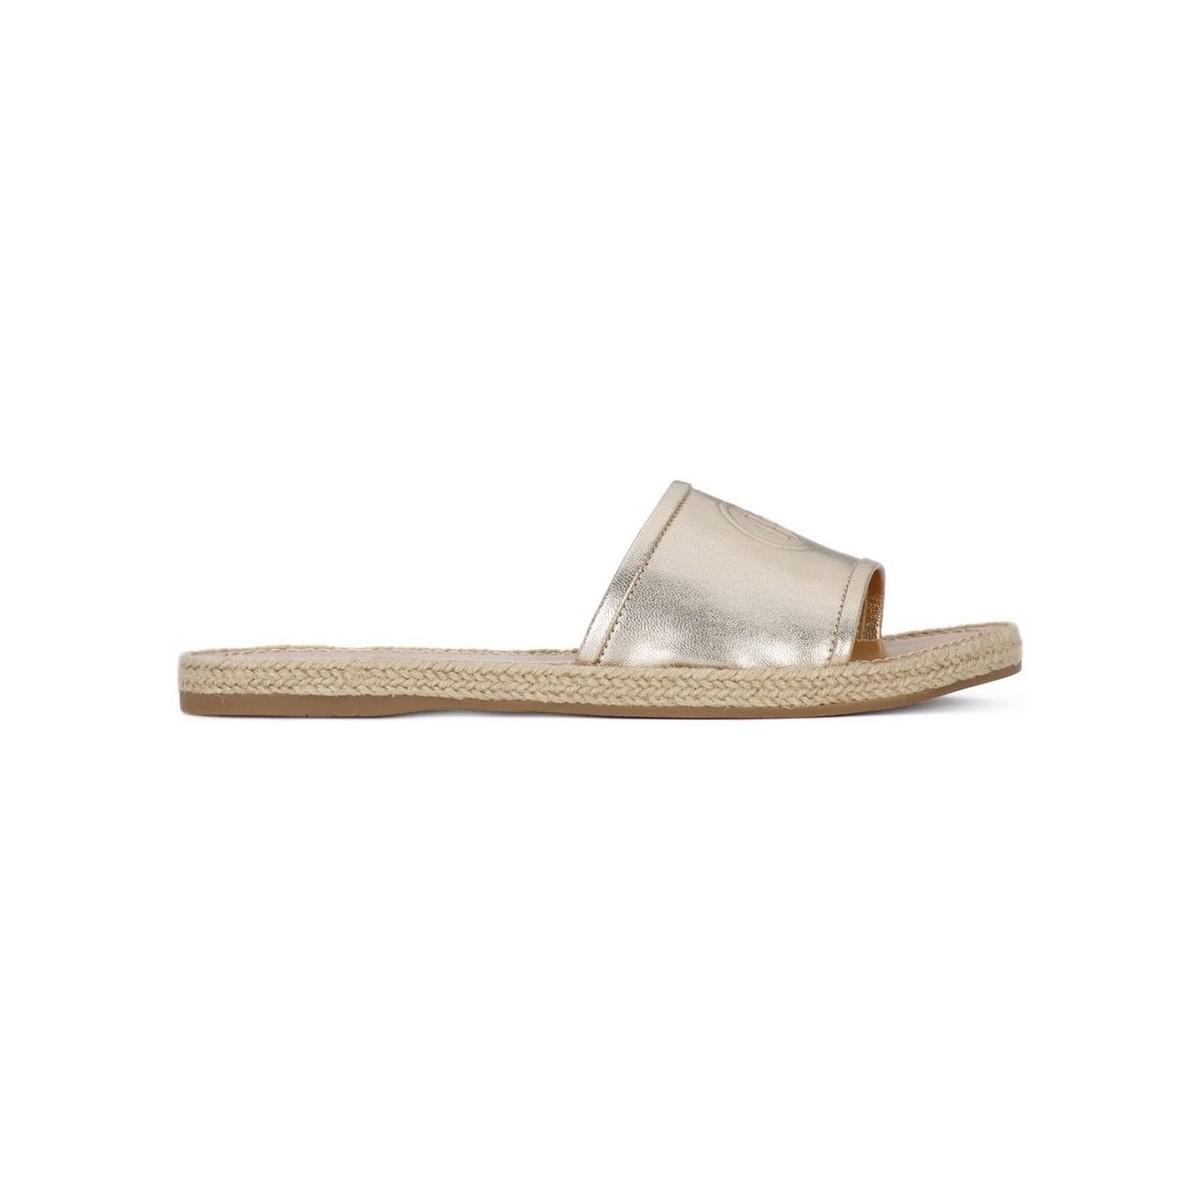 cc5e5685f Tommy Hilfiger 709 Women s Sandals In Silver in Metallic - Lyst